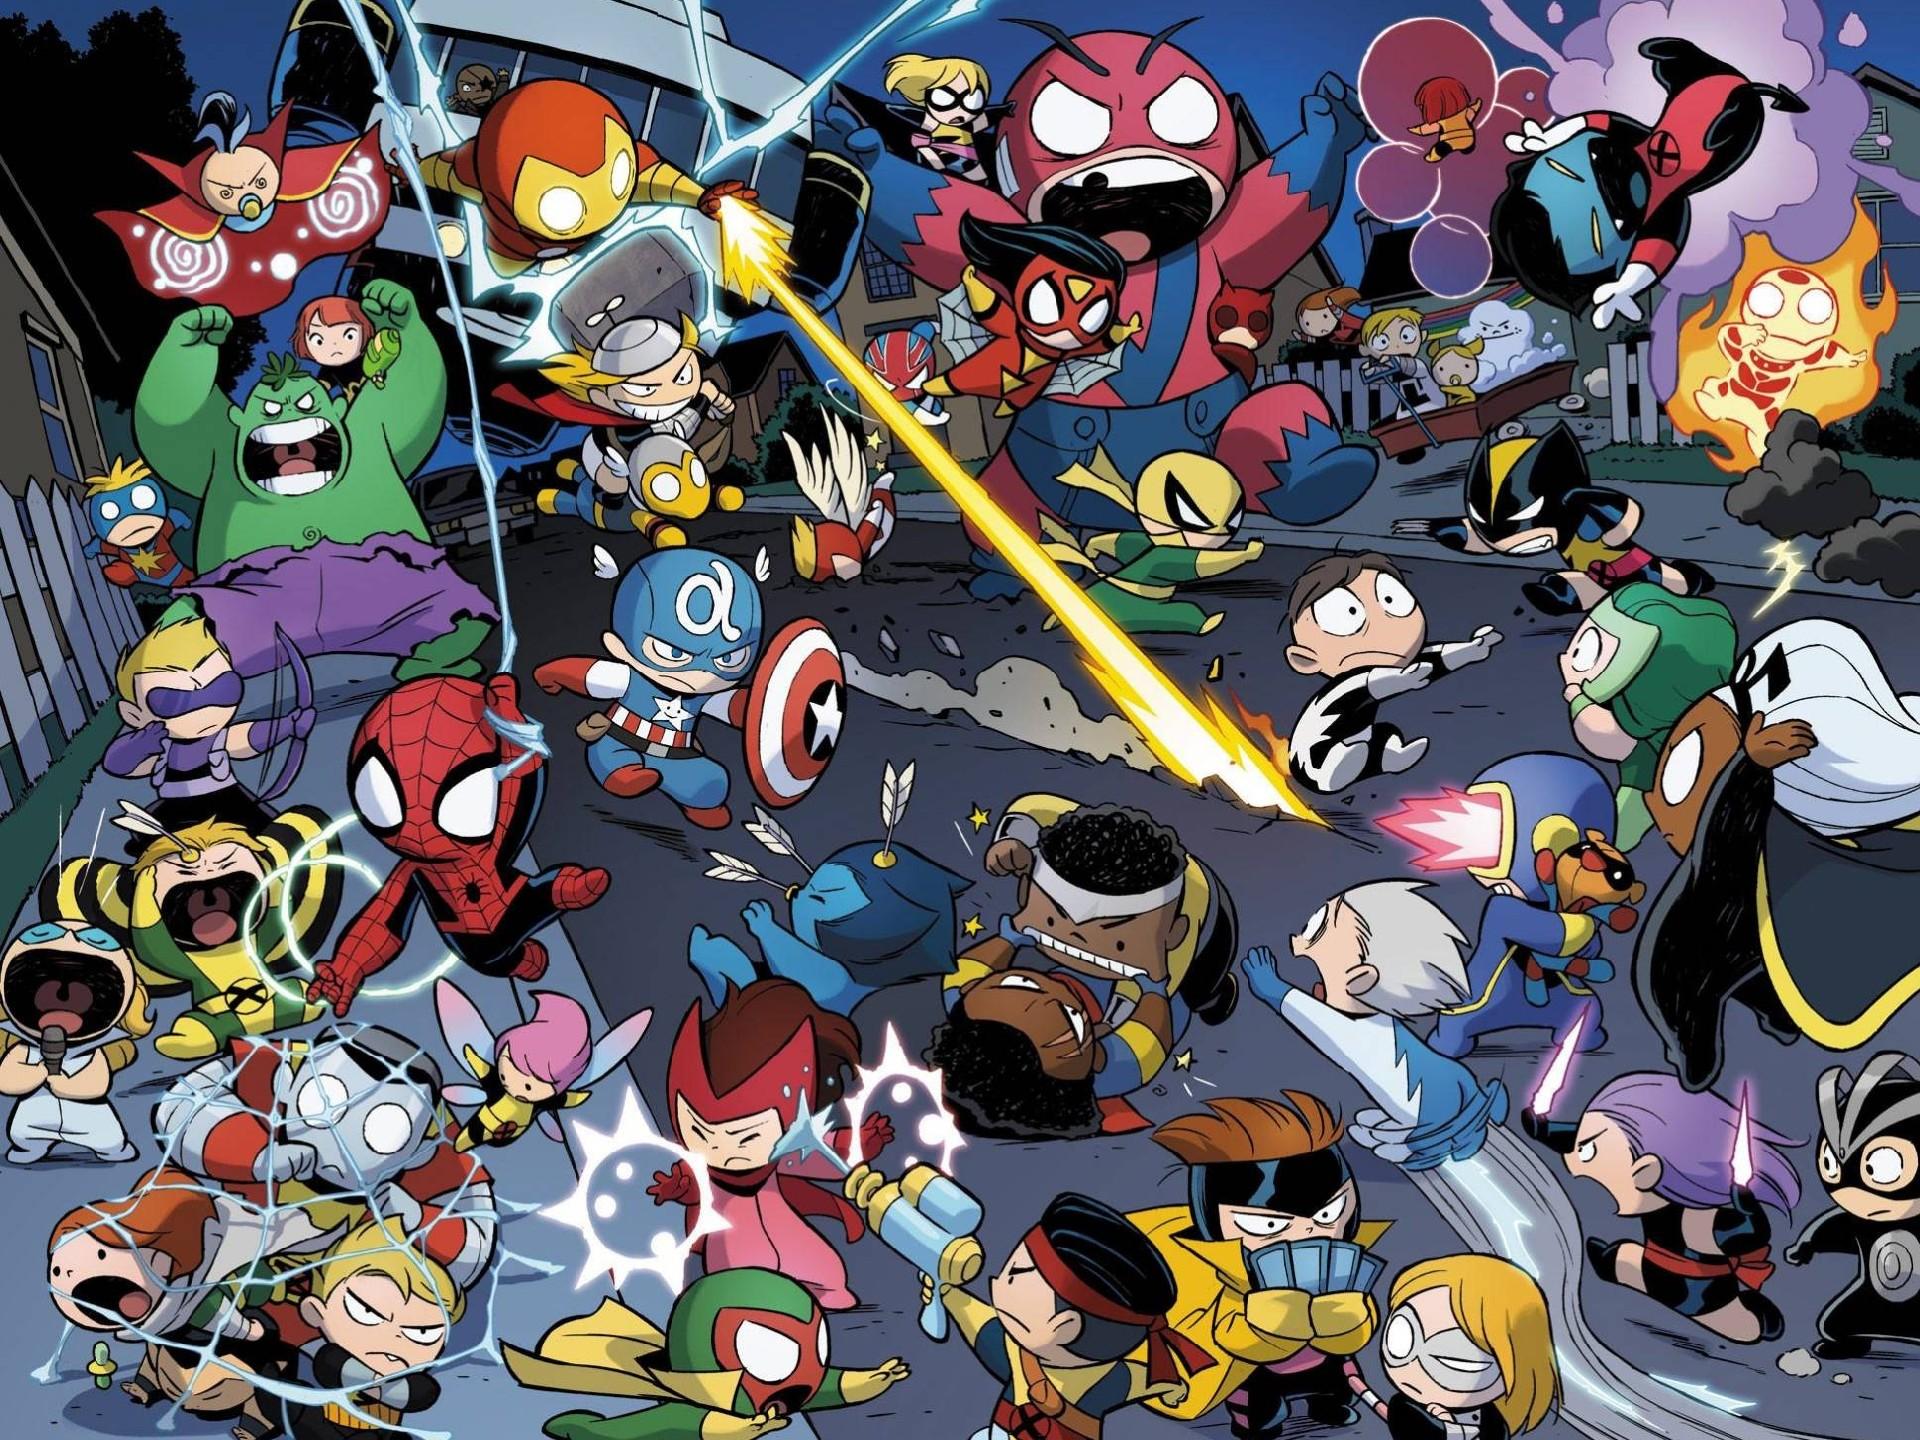 Comics Avengers Vs. X-Men Babies Wallpaper #465863 – Resolution px